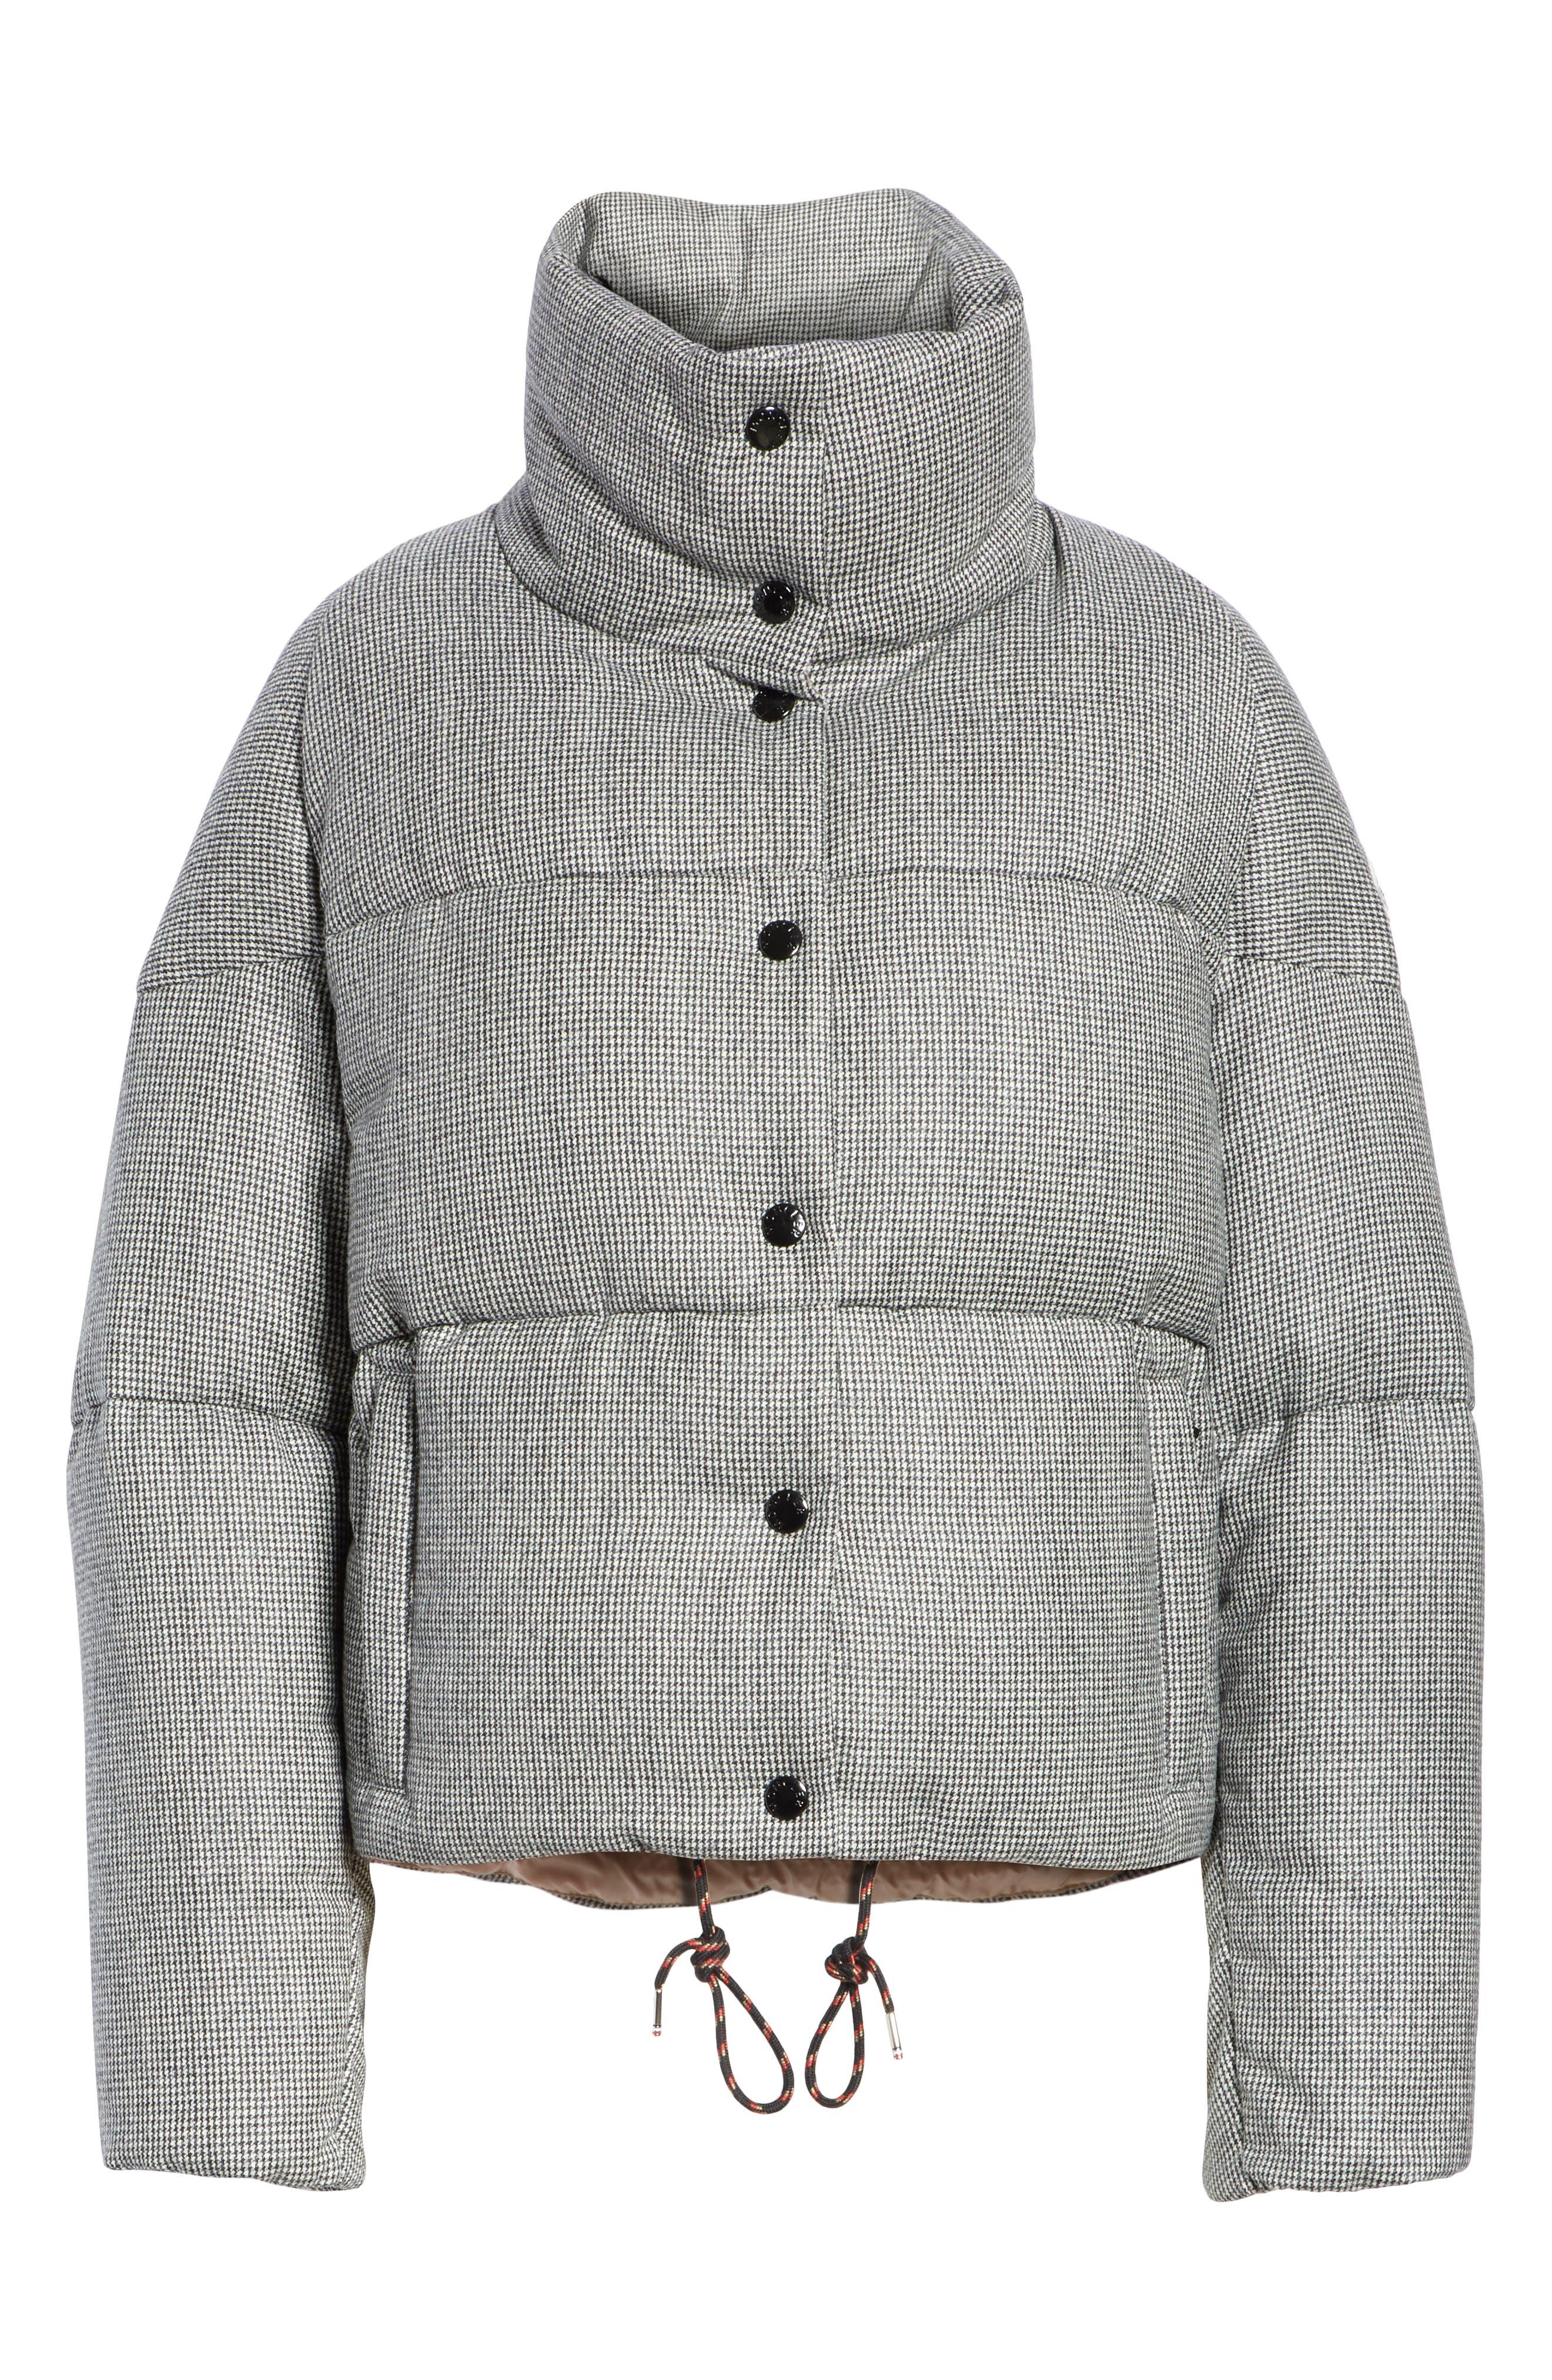 MONCLER,                             Cer Wool Down Puffer Jacket,                             Alternate thumbnail 5, color,                             BLACK